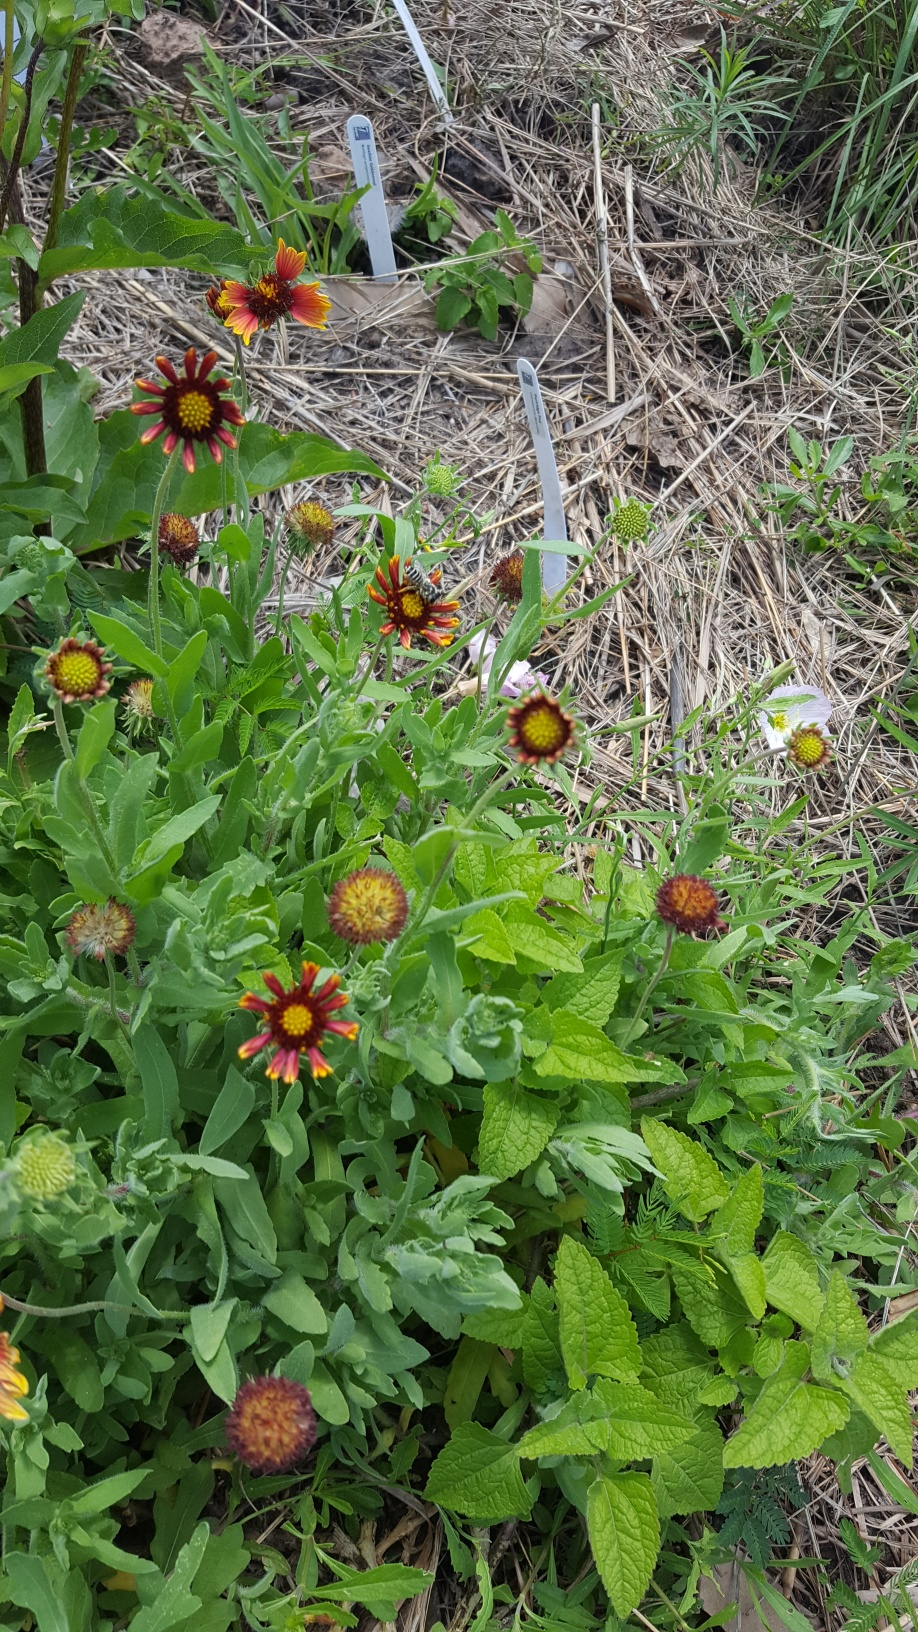 Seabourne Nature Park Prairie Garden Gallardia Basket Flower on Earth Day 2019 by TMN Kimberly Farou (1)